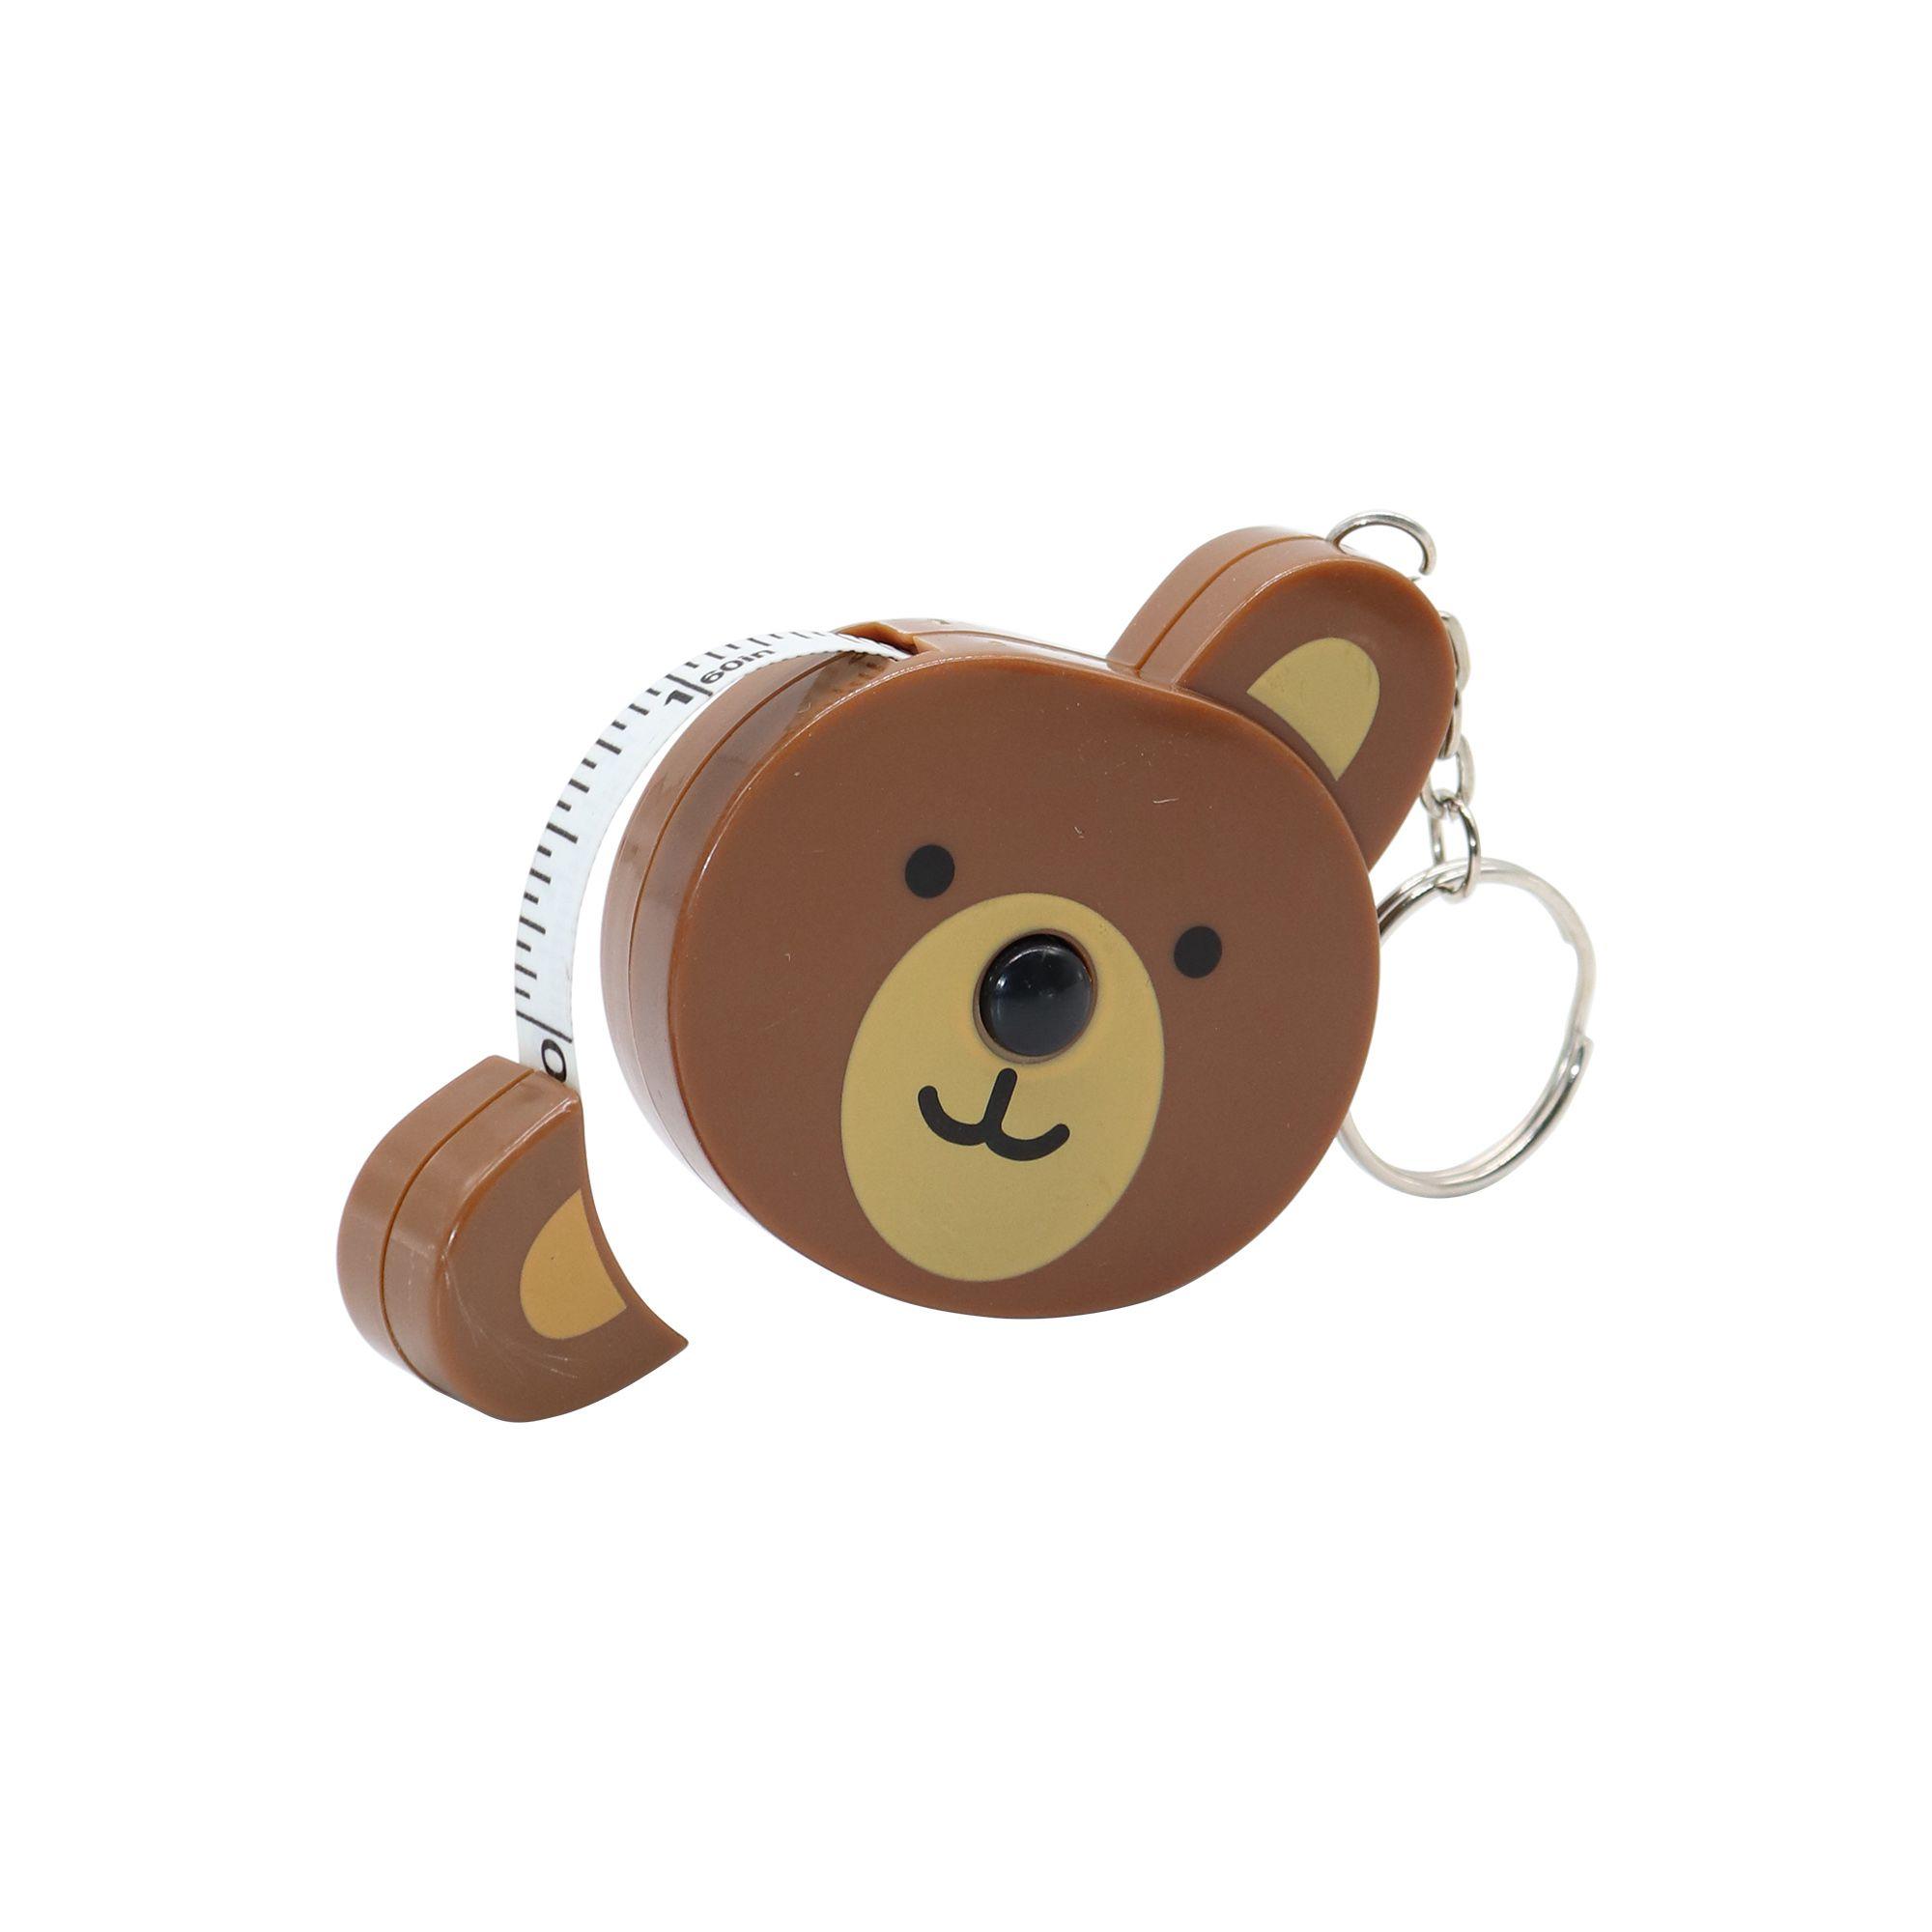 Fita métrica urso 150cm